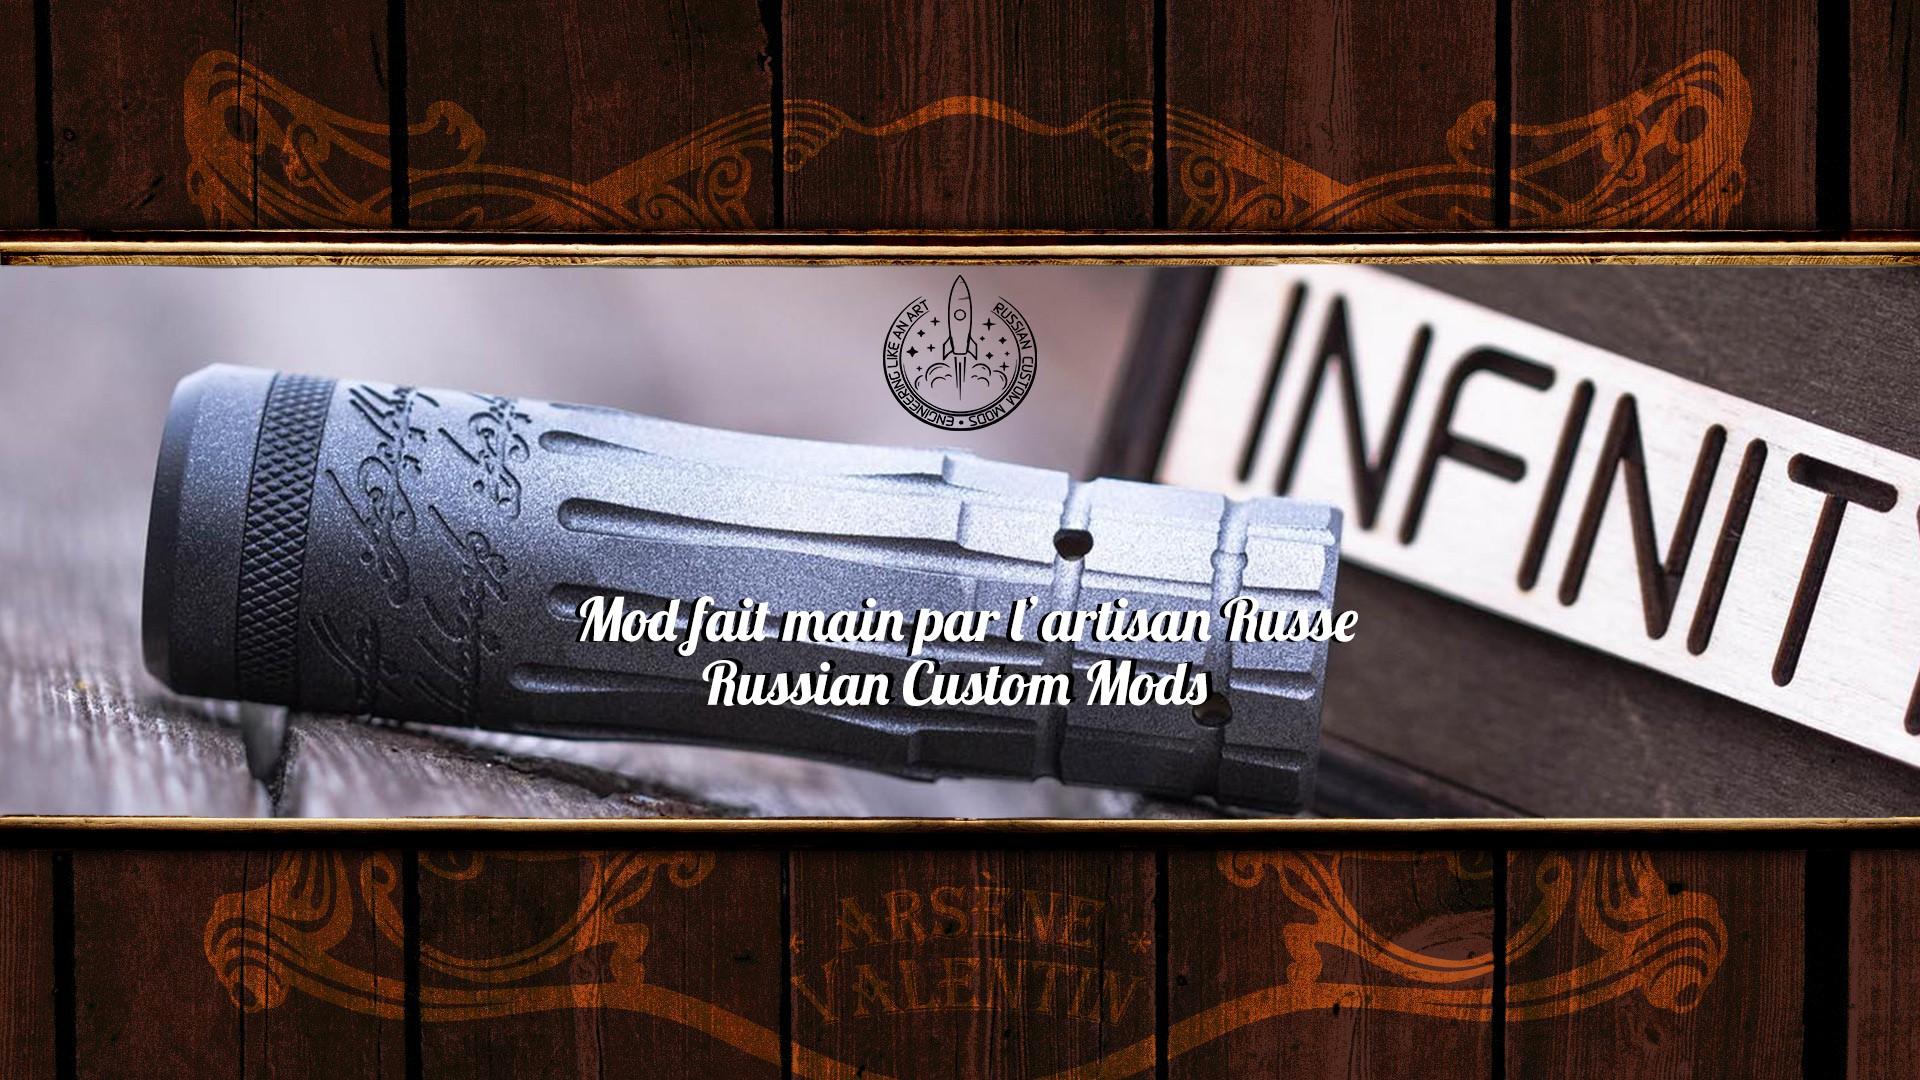 Russian Custom Mods